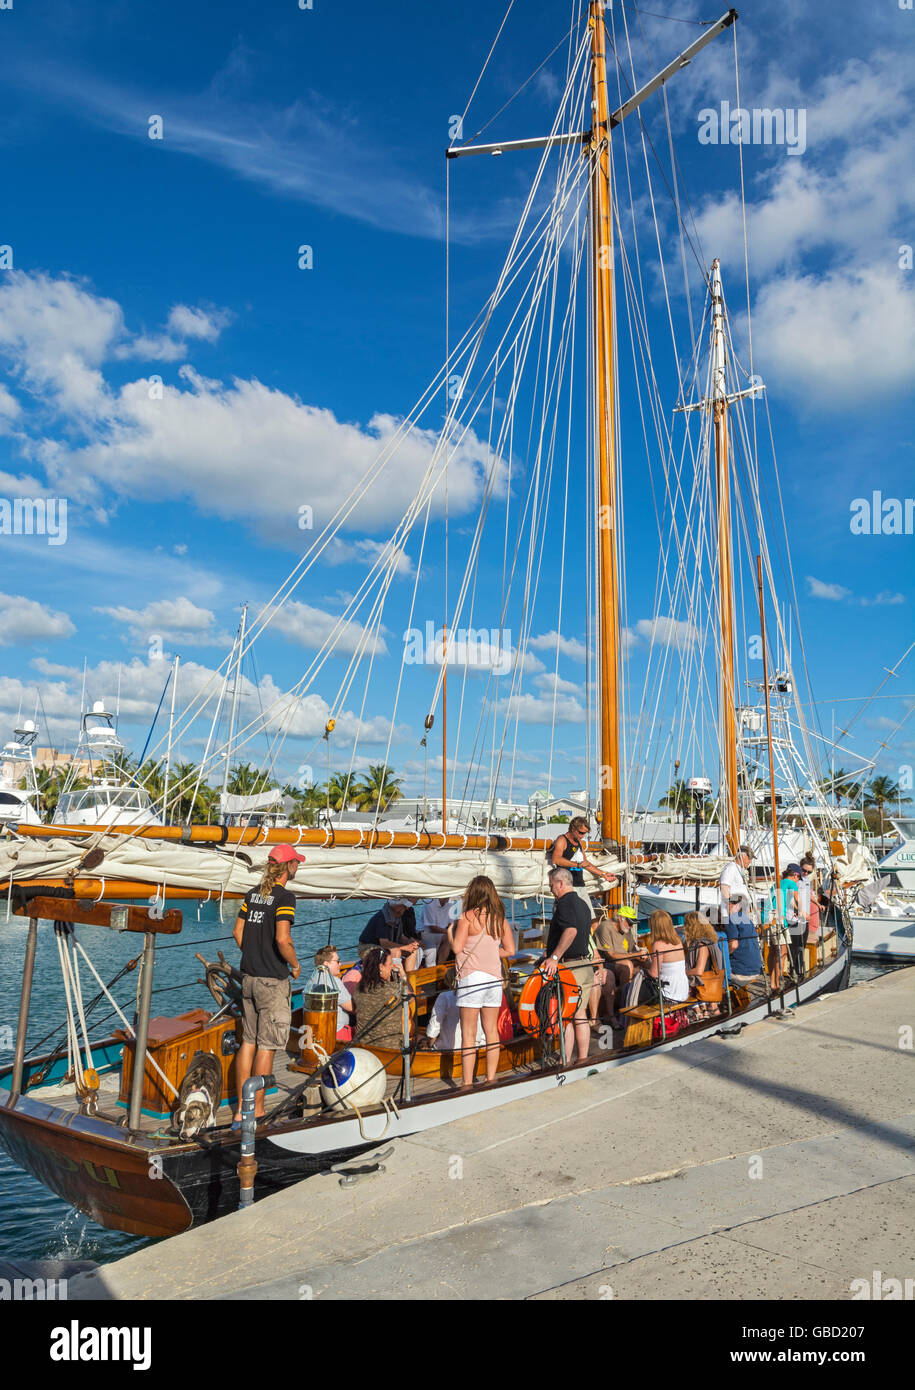 Florida, Key West, charter sailing yacht Schooner 'Hindu' built 1925, departing for sunset cruise - Stock Image